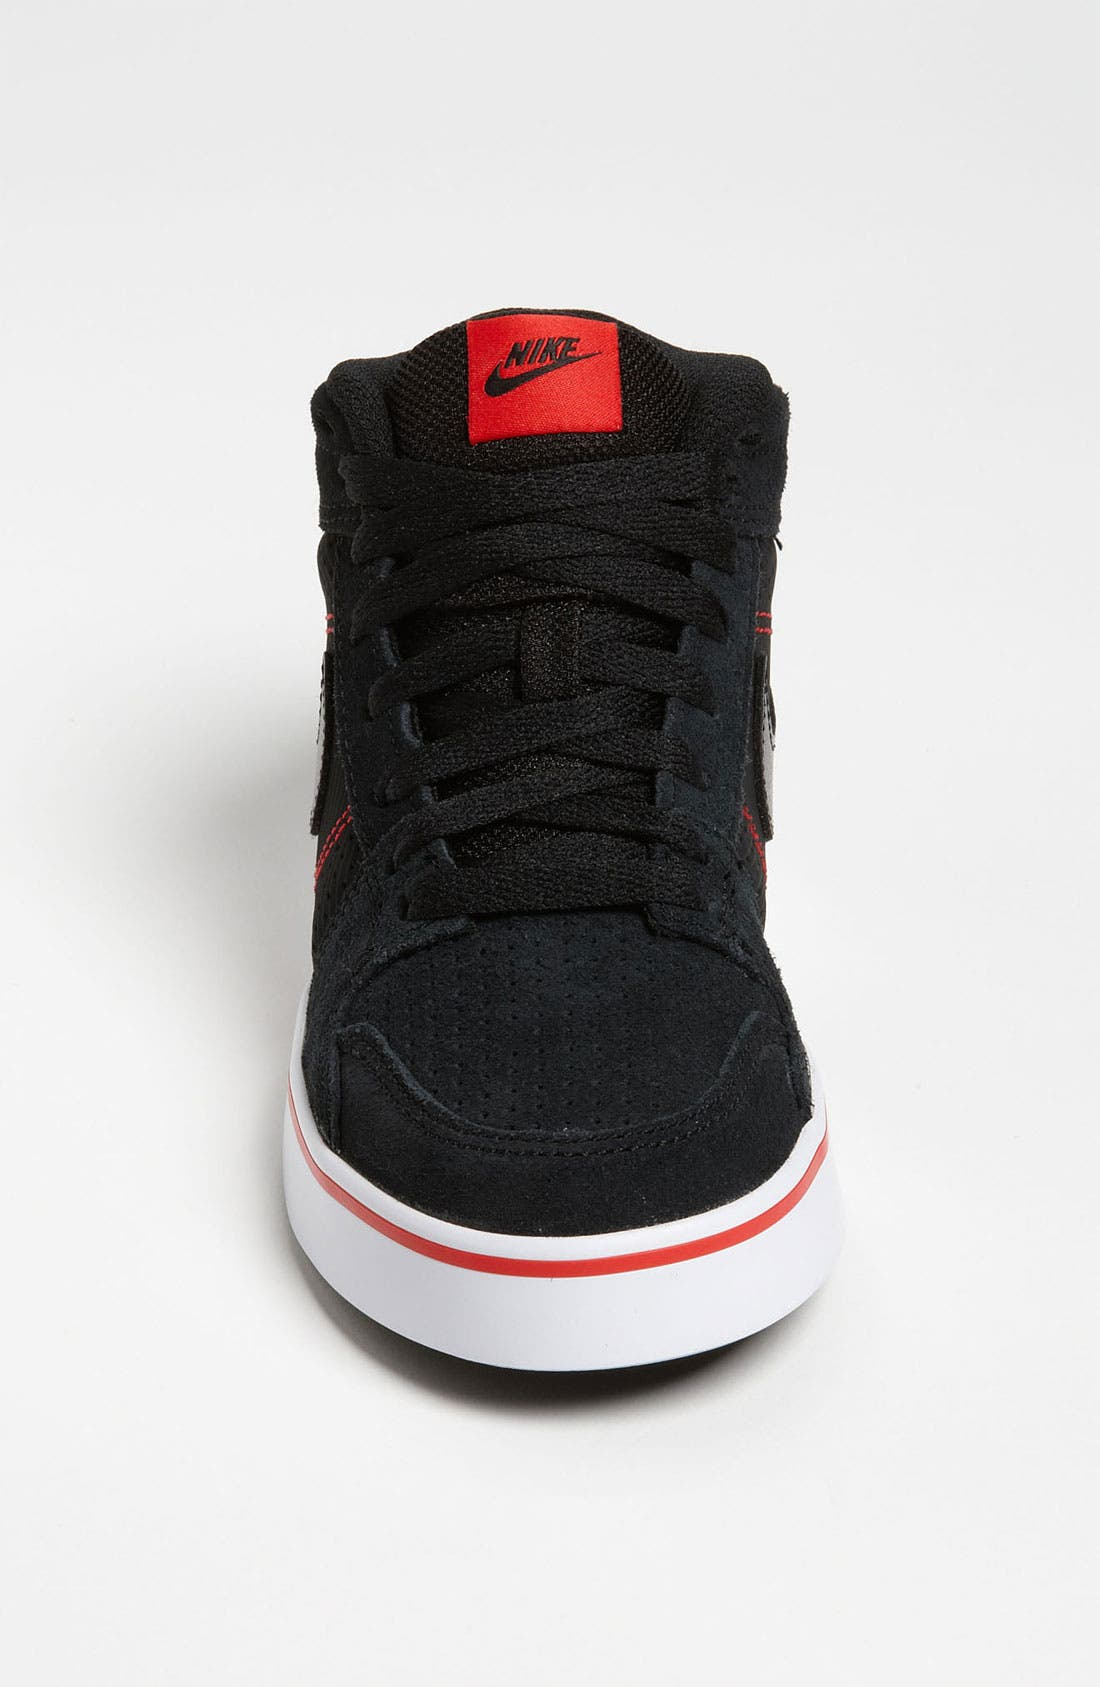 Alternate Image 3  - Nike 'Ruckus Mid Jr. 6.0' Sneaker (Toddler, Little Kid & Big Kid)